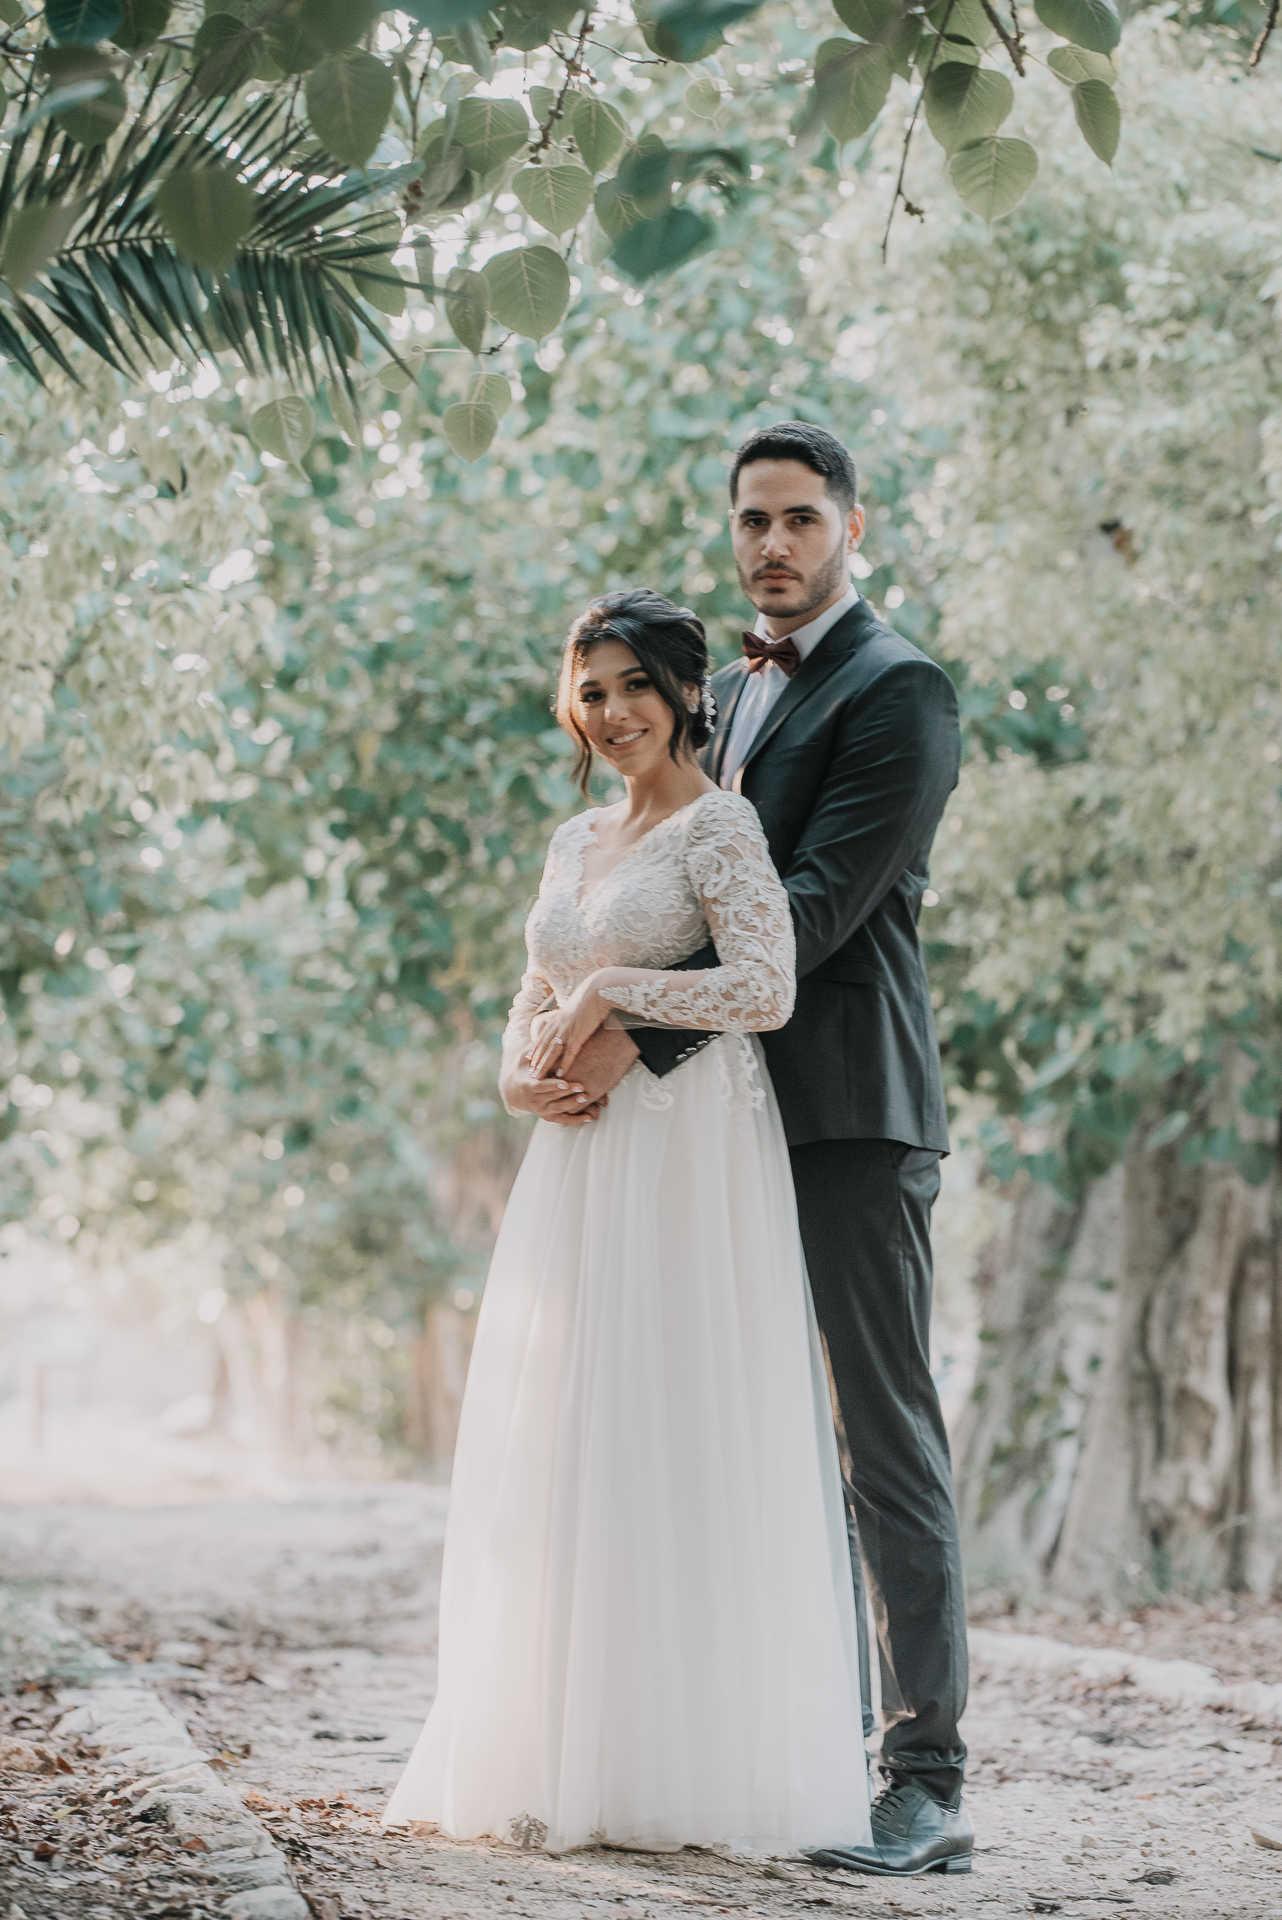 Eden & Gili חתונות קטנות